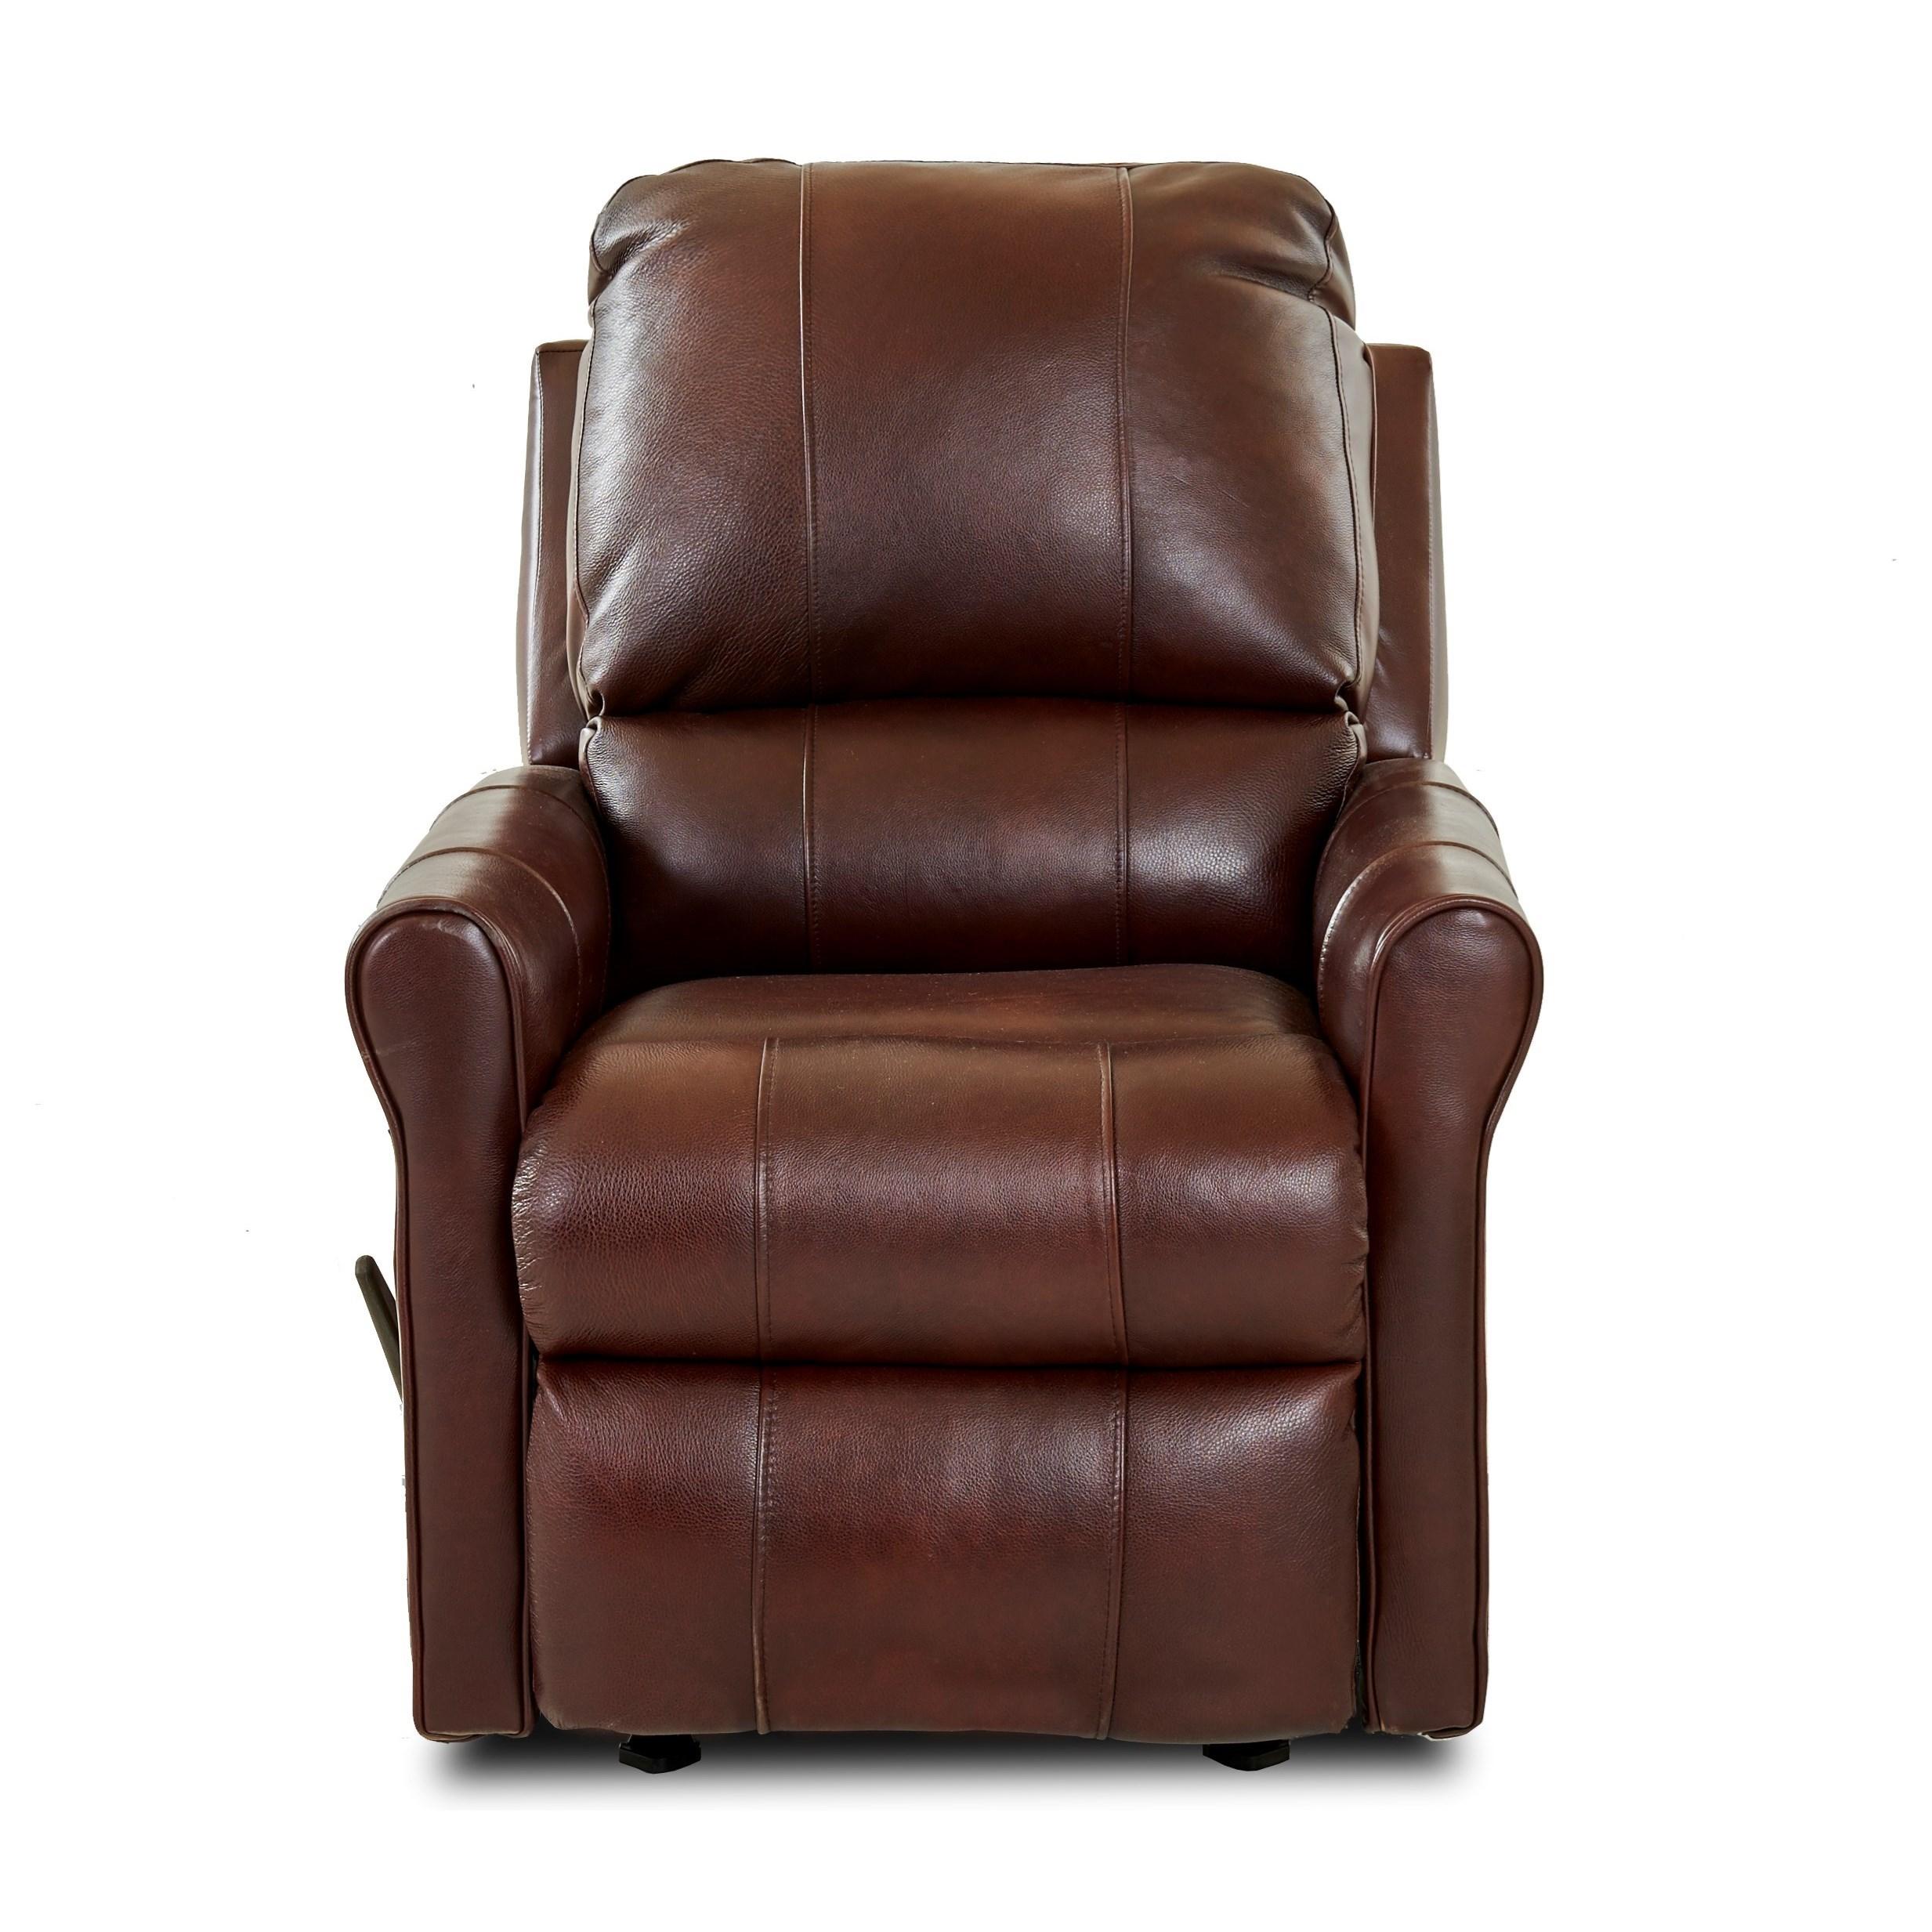 Baja Reclining Rocking Chair by Klaussner at Lapeer Furniture & Mattress Center